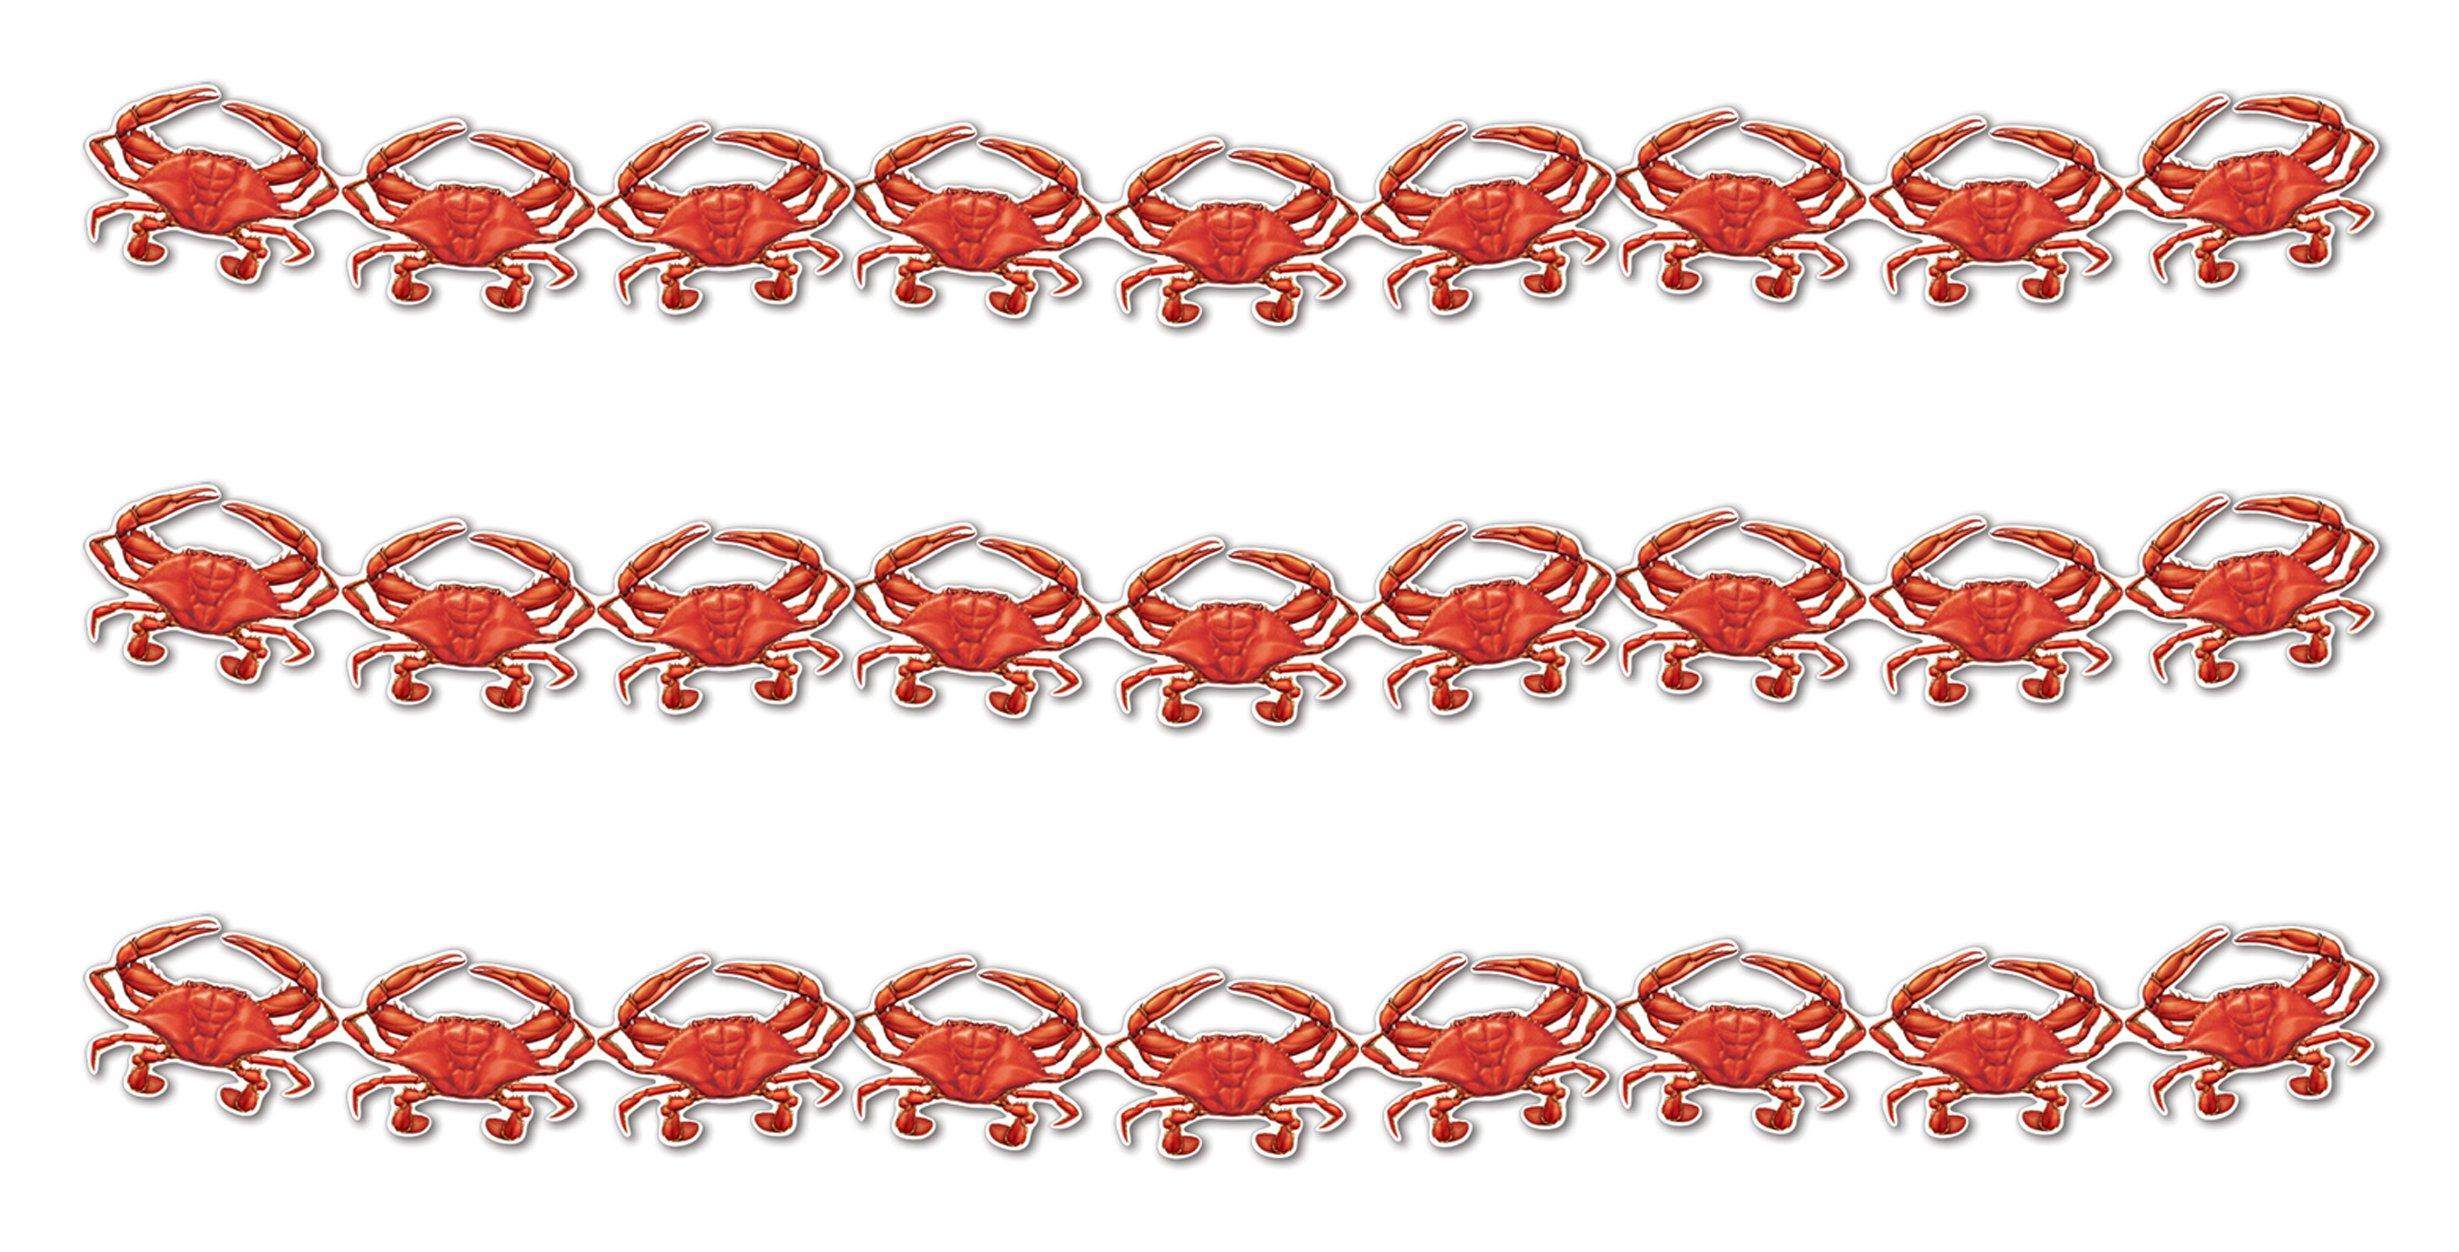 Beistle S57445AZ3, 3 Piece Crab Streamers, 6.5'' x 6' (Red/White)